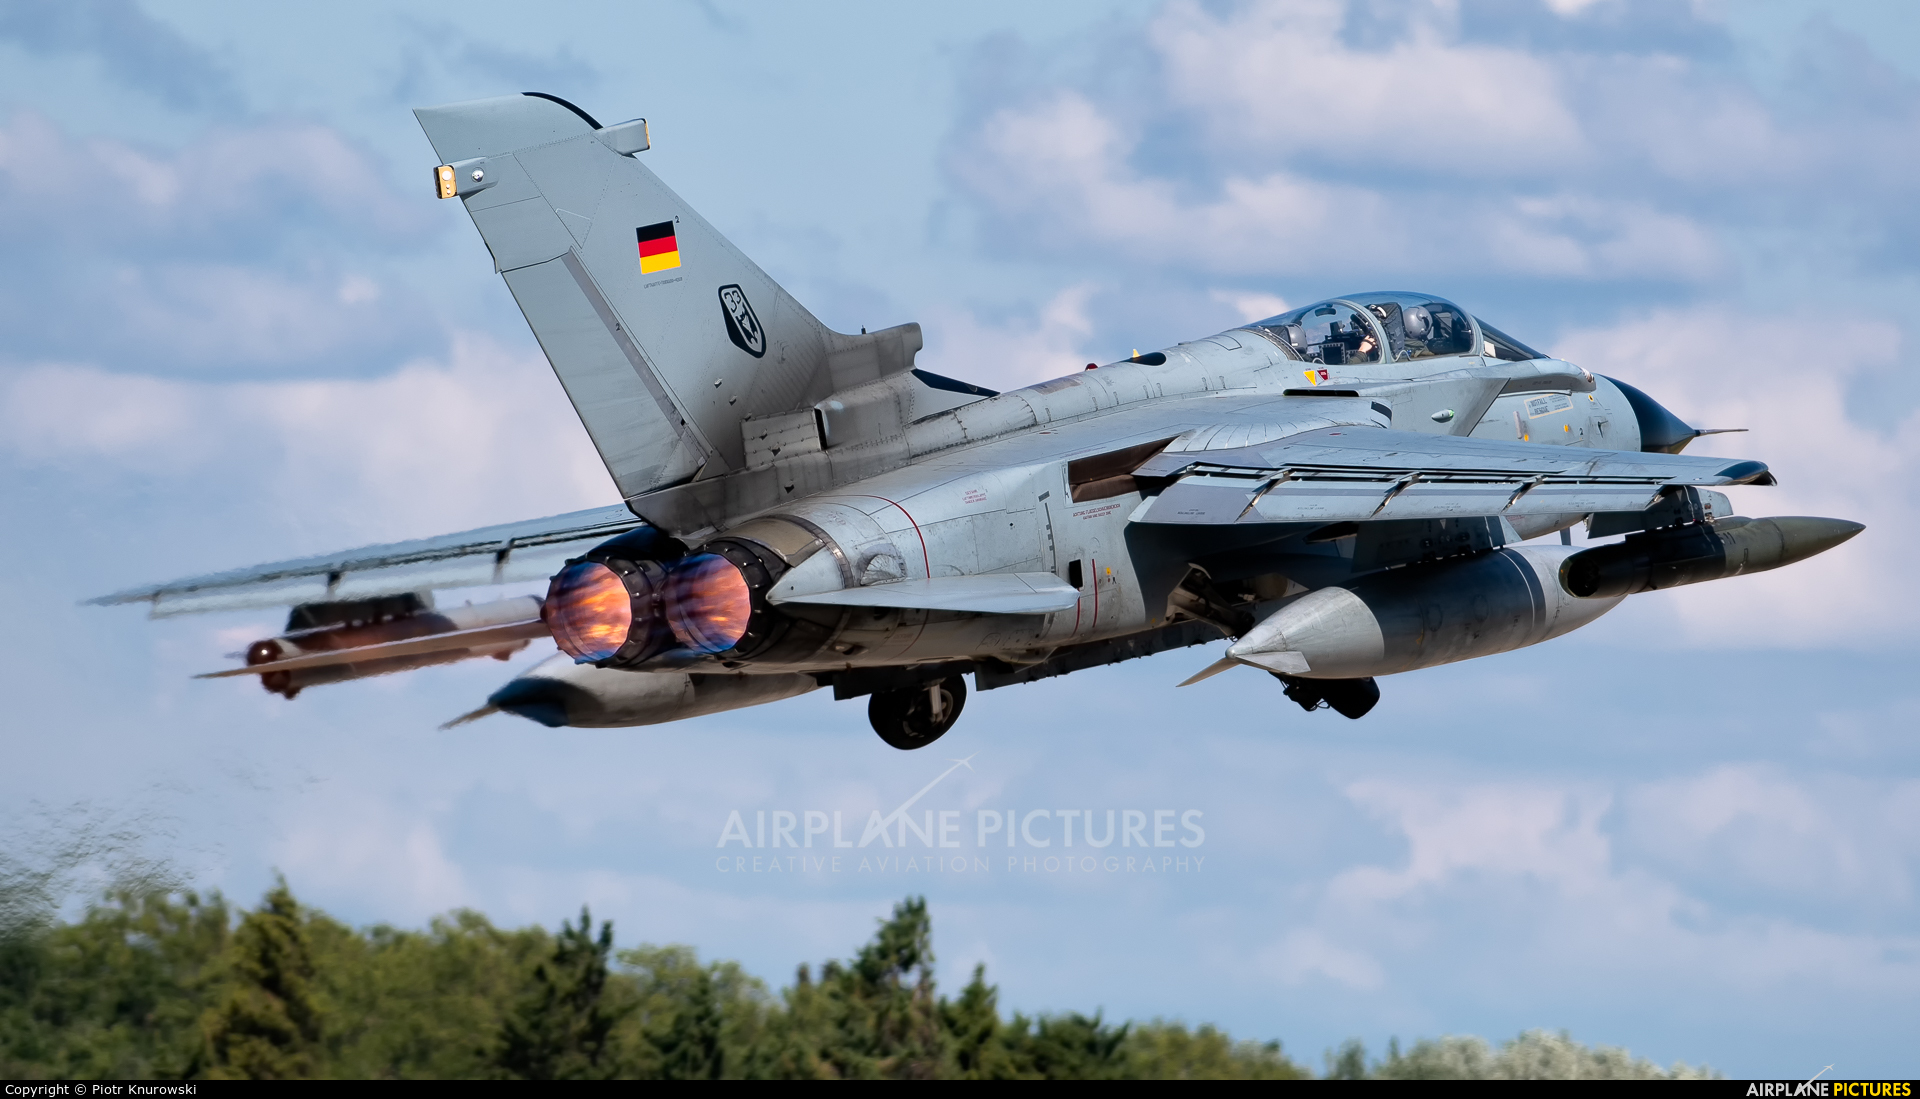 Germany - Air Force 45+69 aircraft at Orange - Caritat